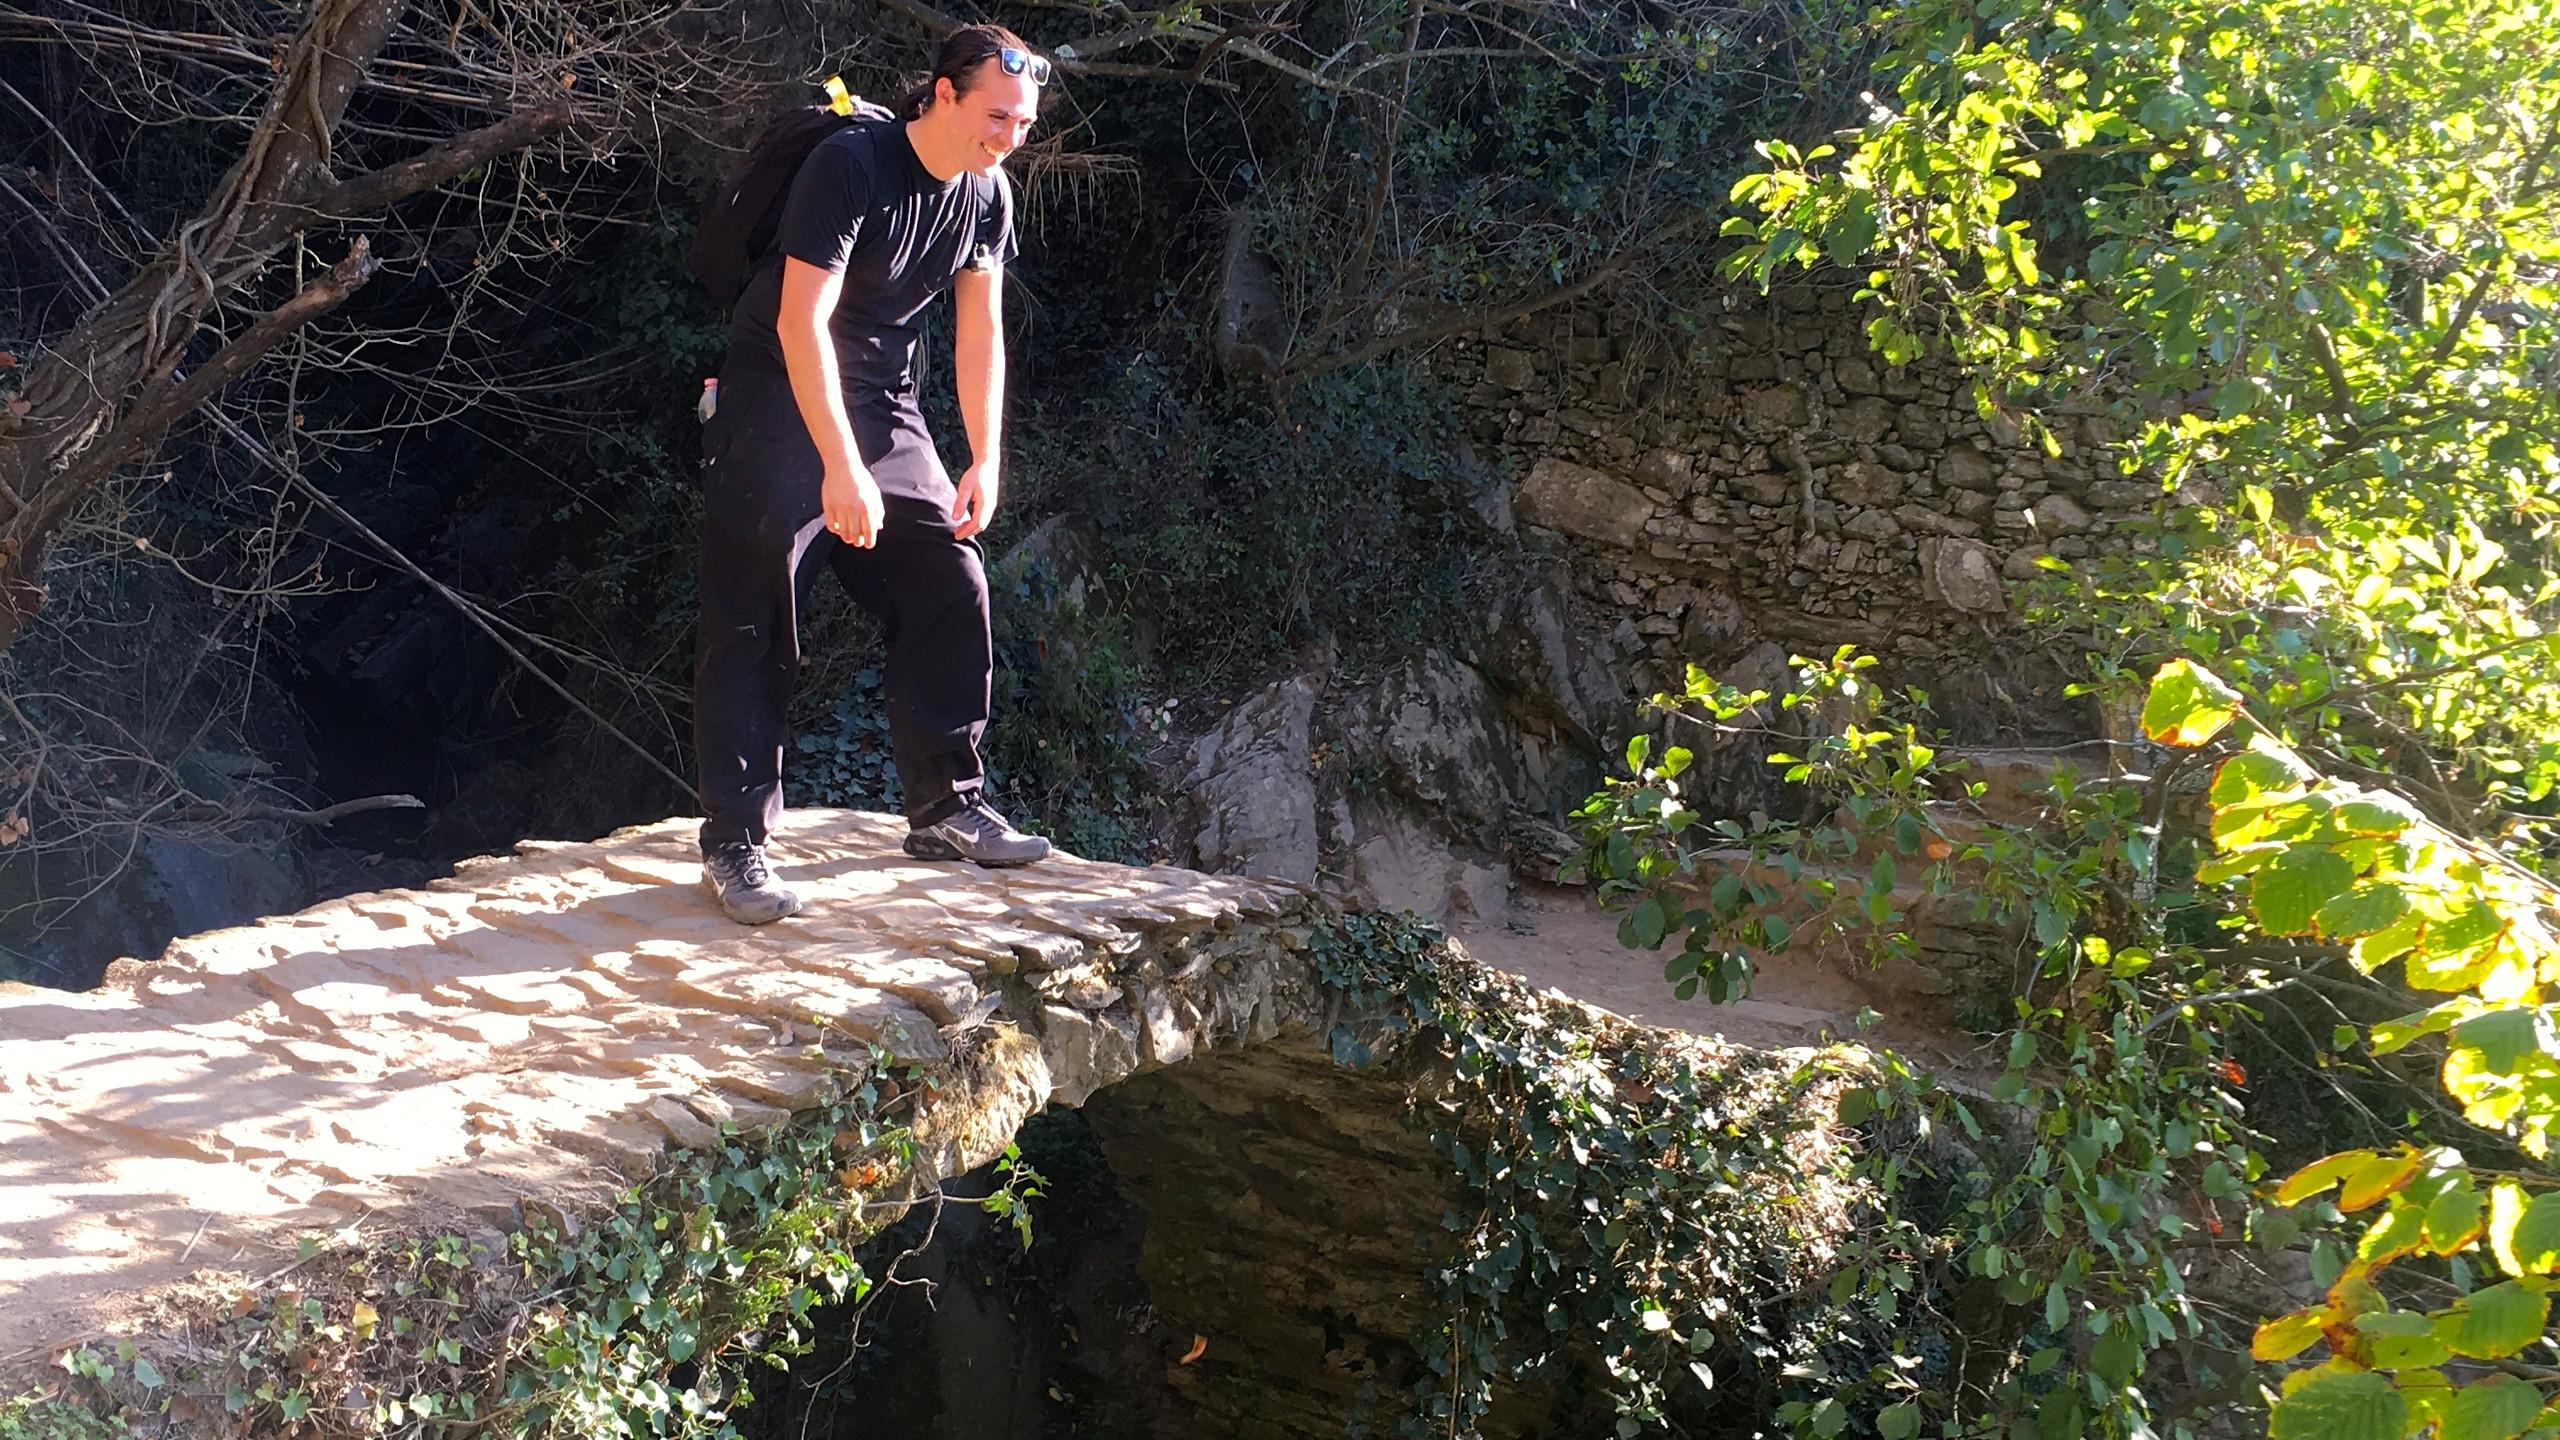 Ian taking a break over a small bridge